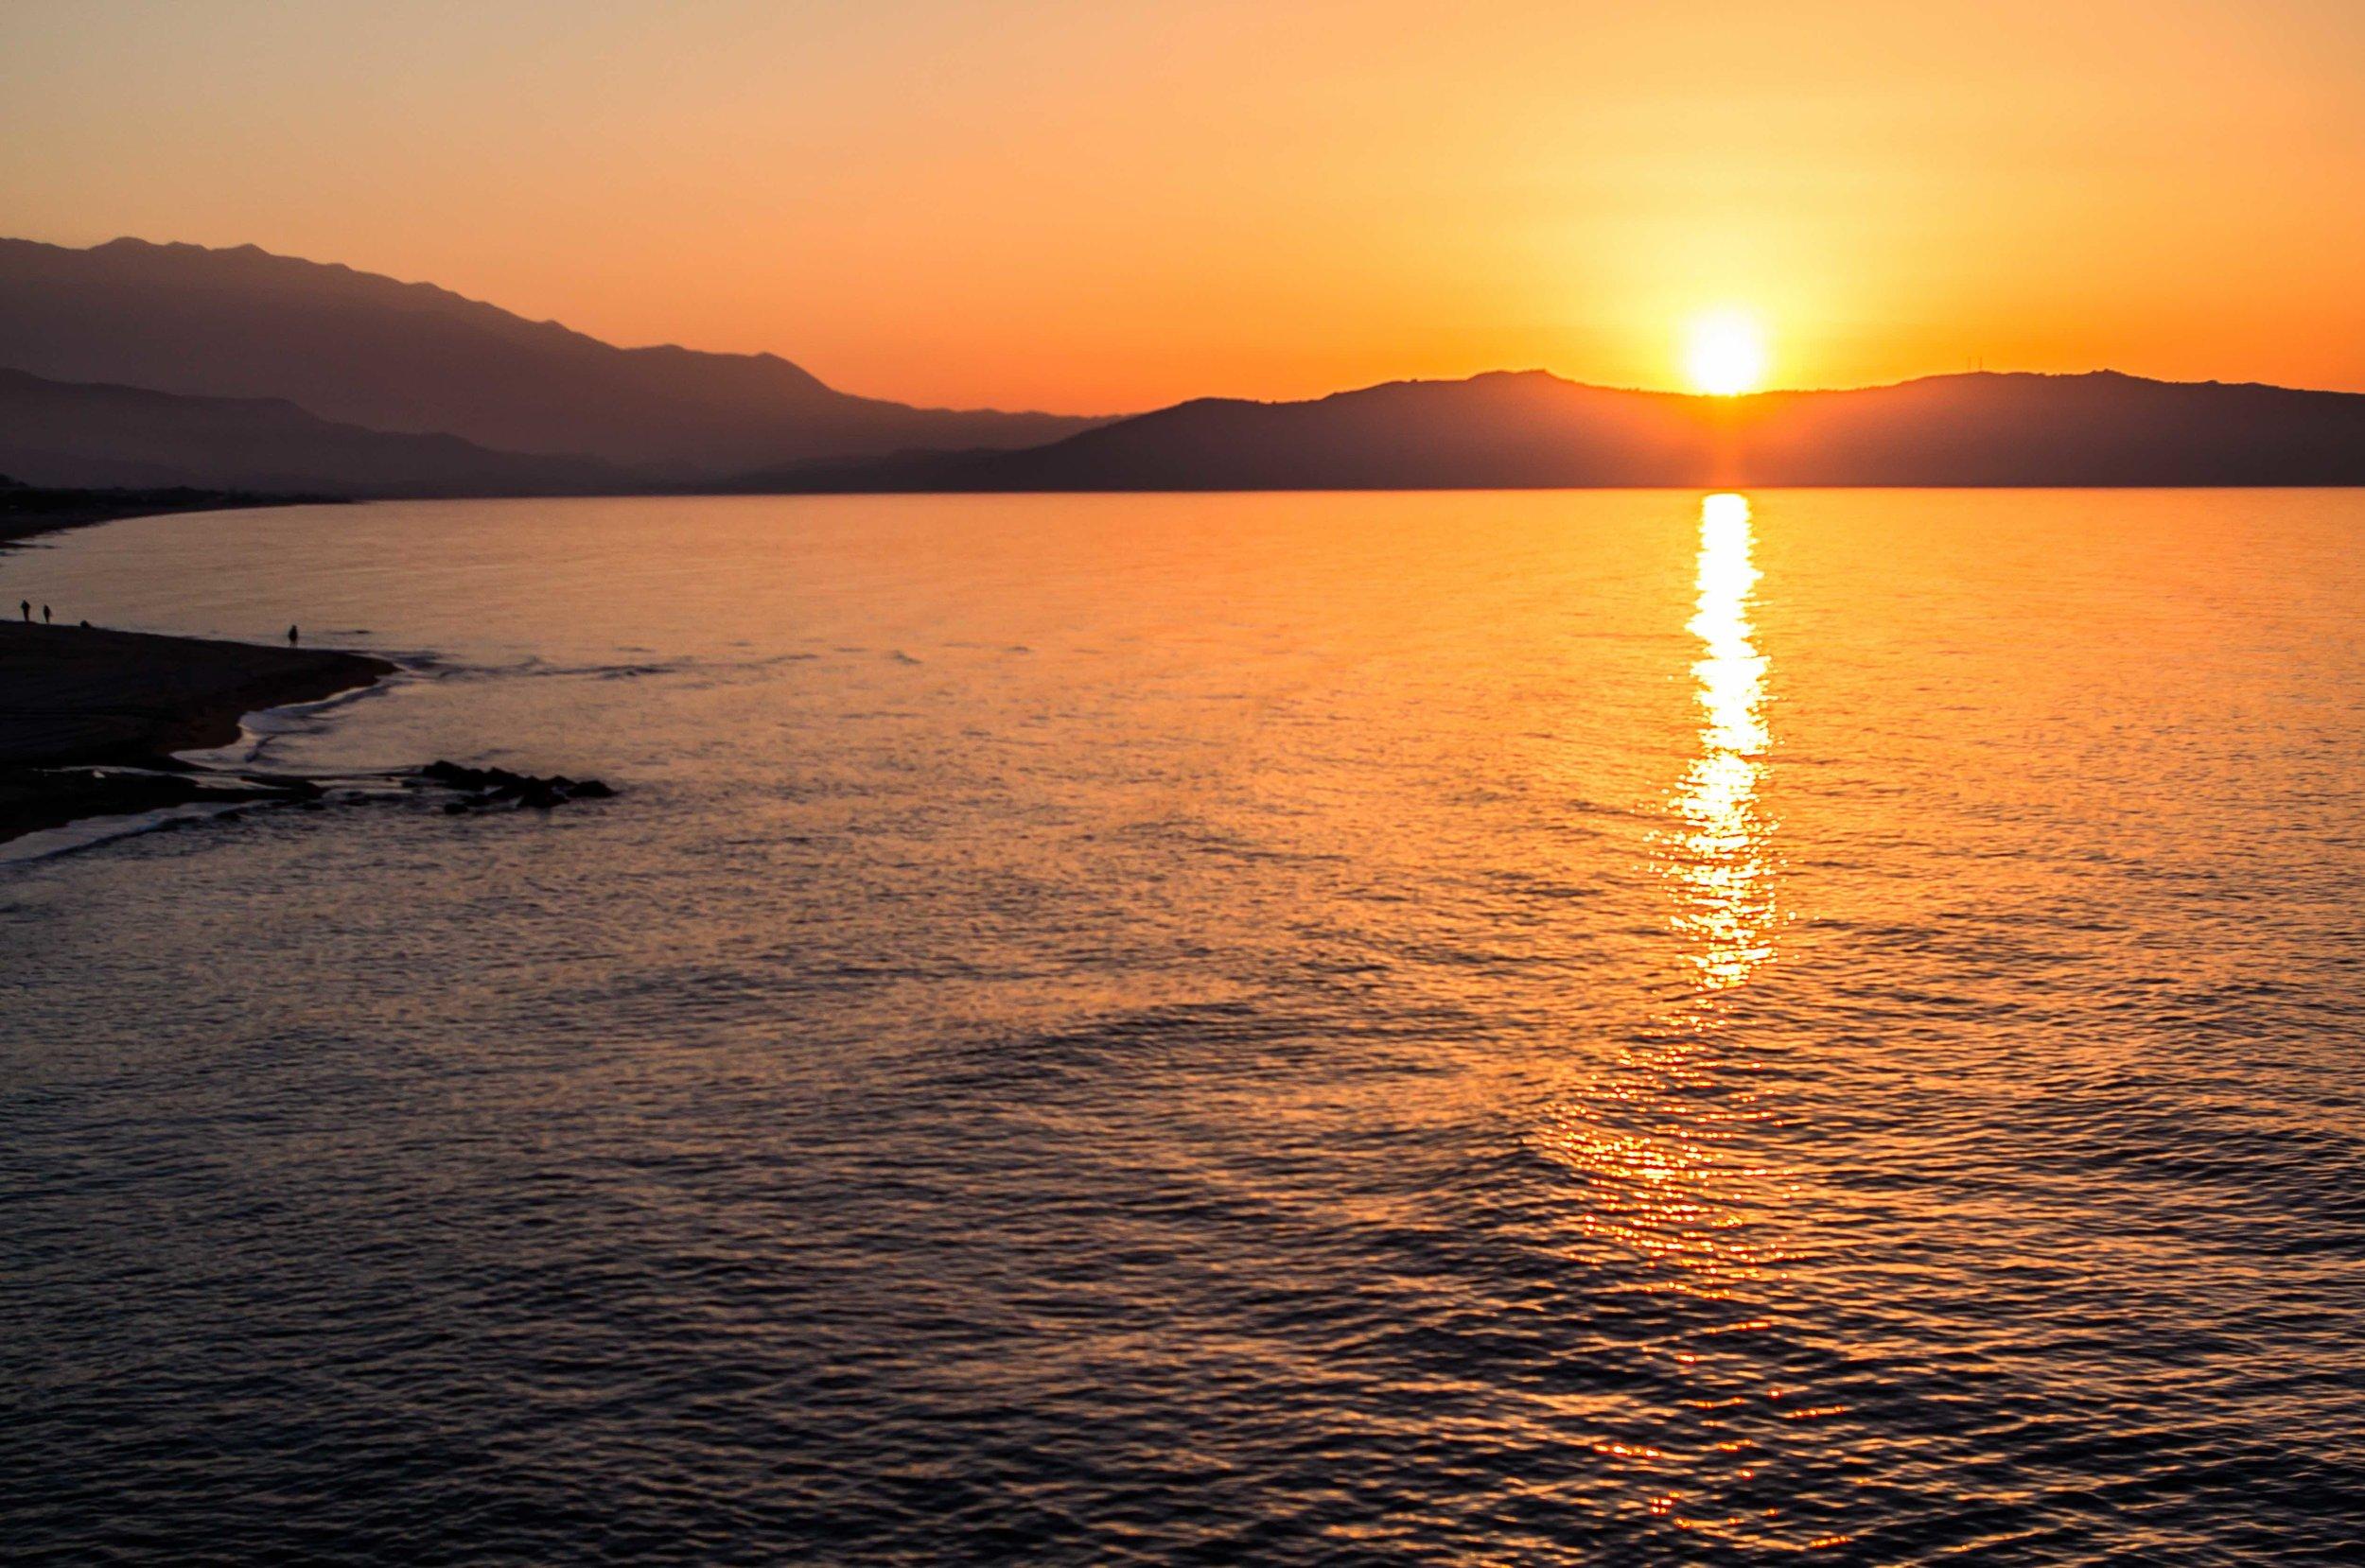 iStock-695123520 Sunset POROS.jpg